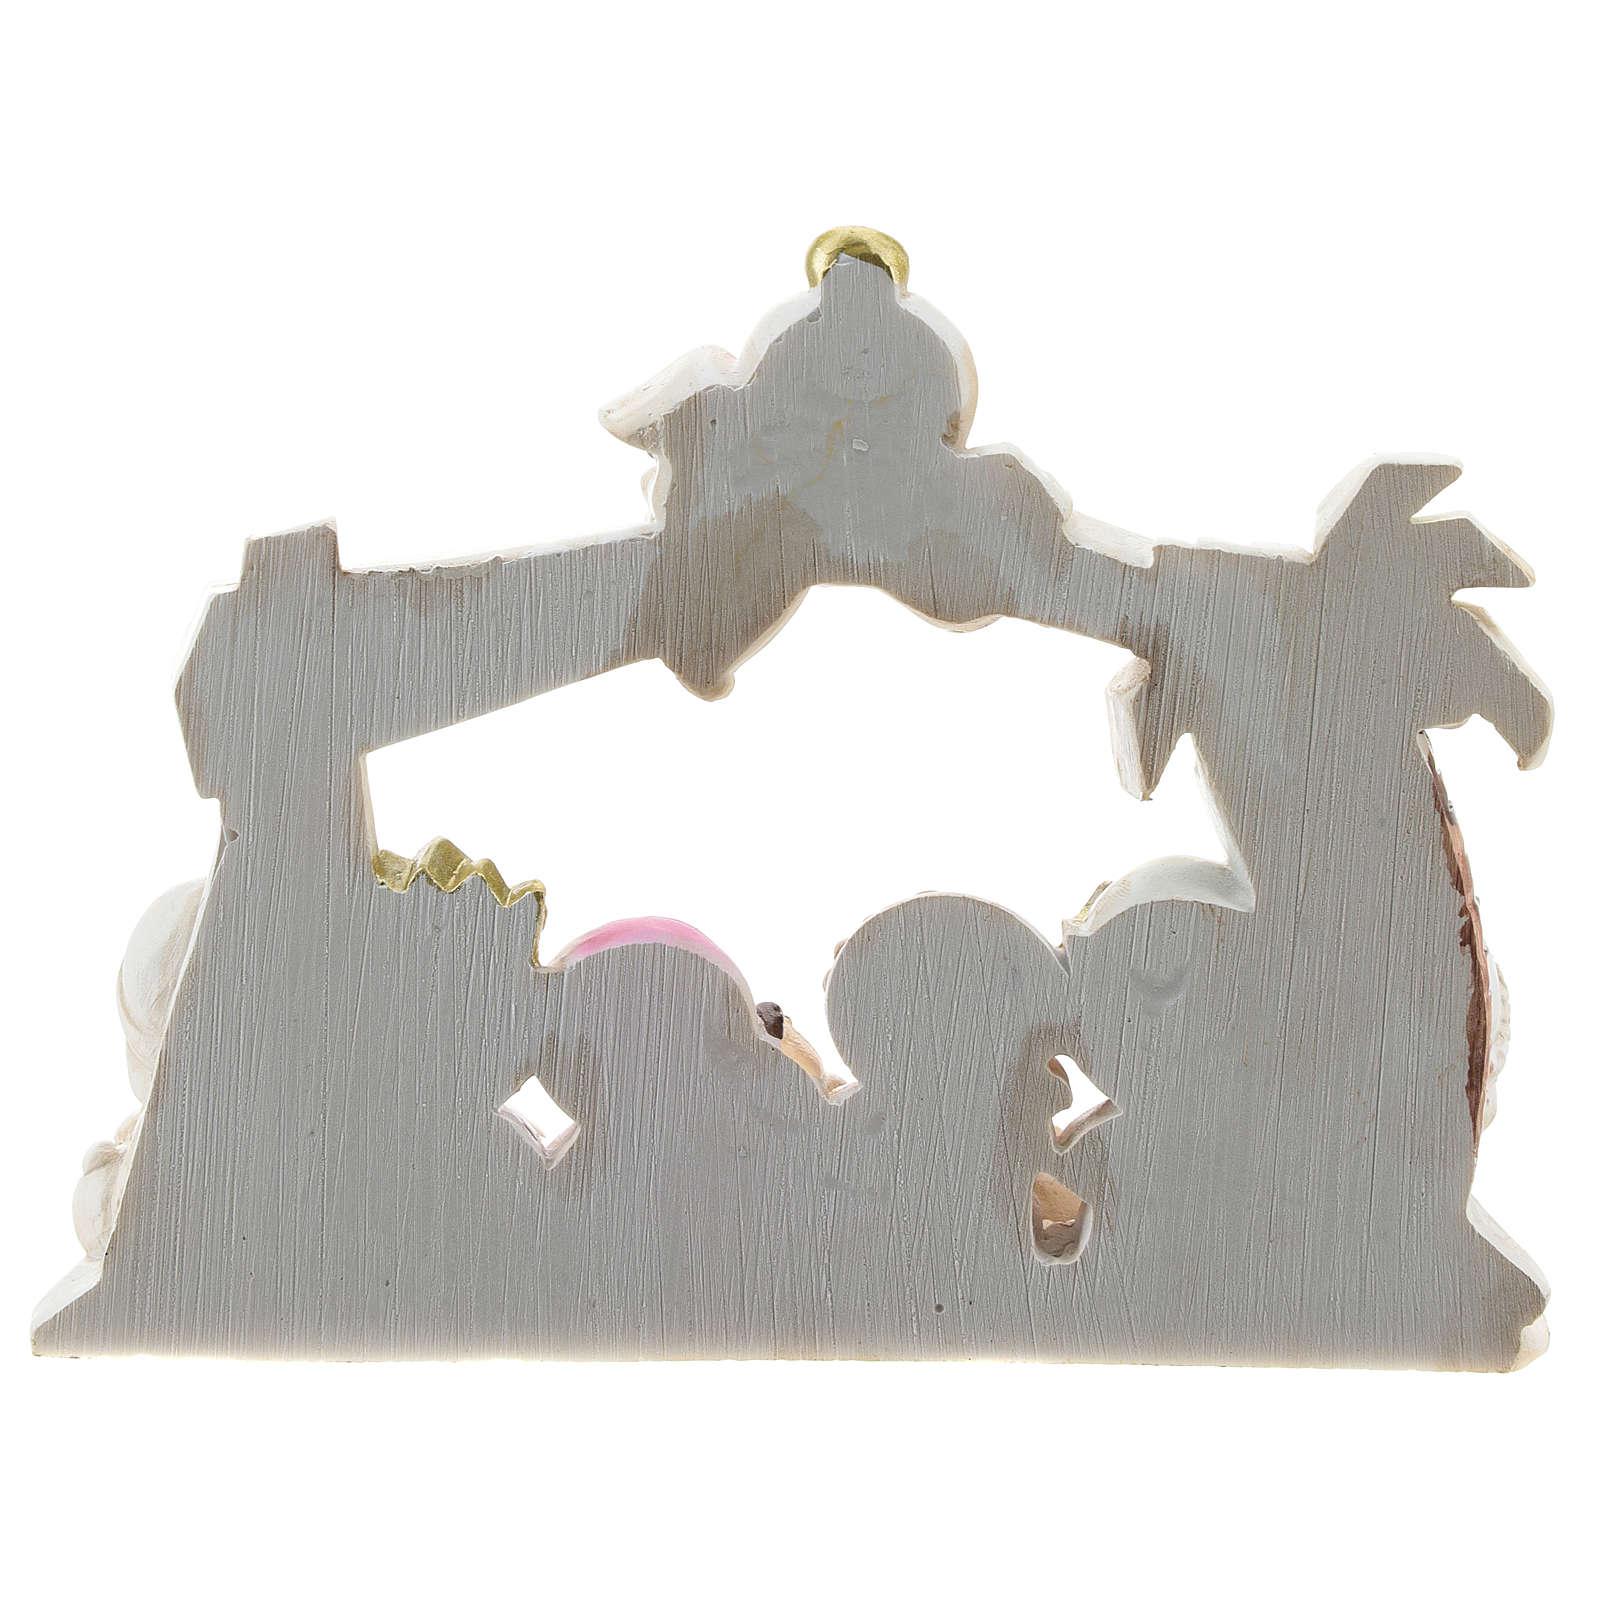 Presepe resina capanna 10 personaggi 16x12 cm linea bambini 4